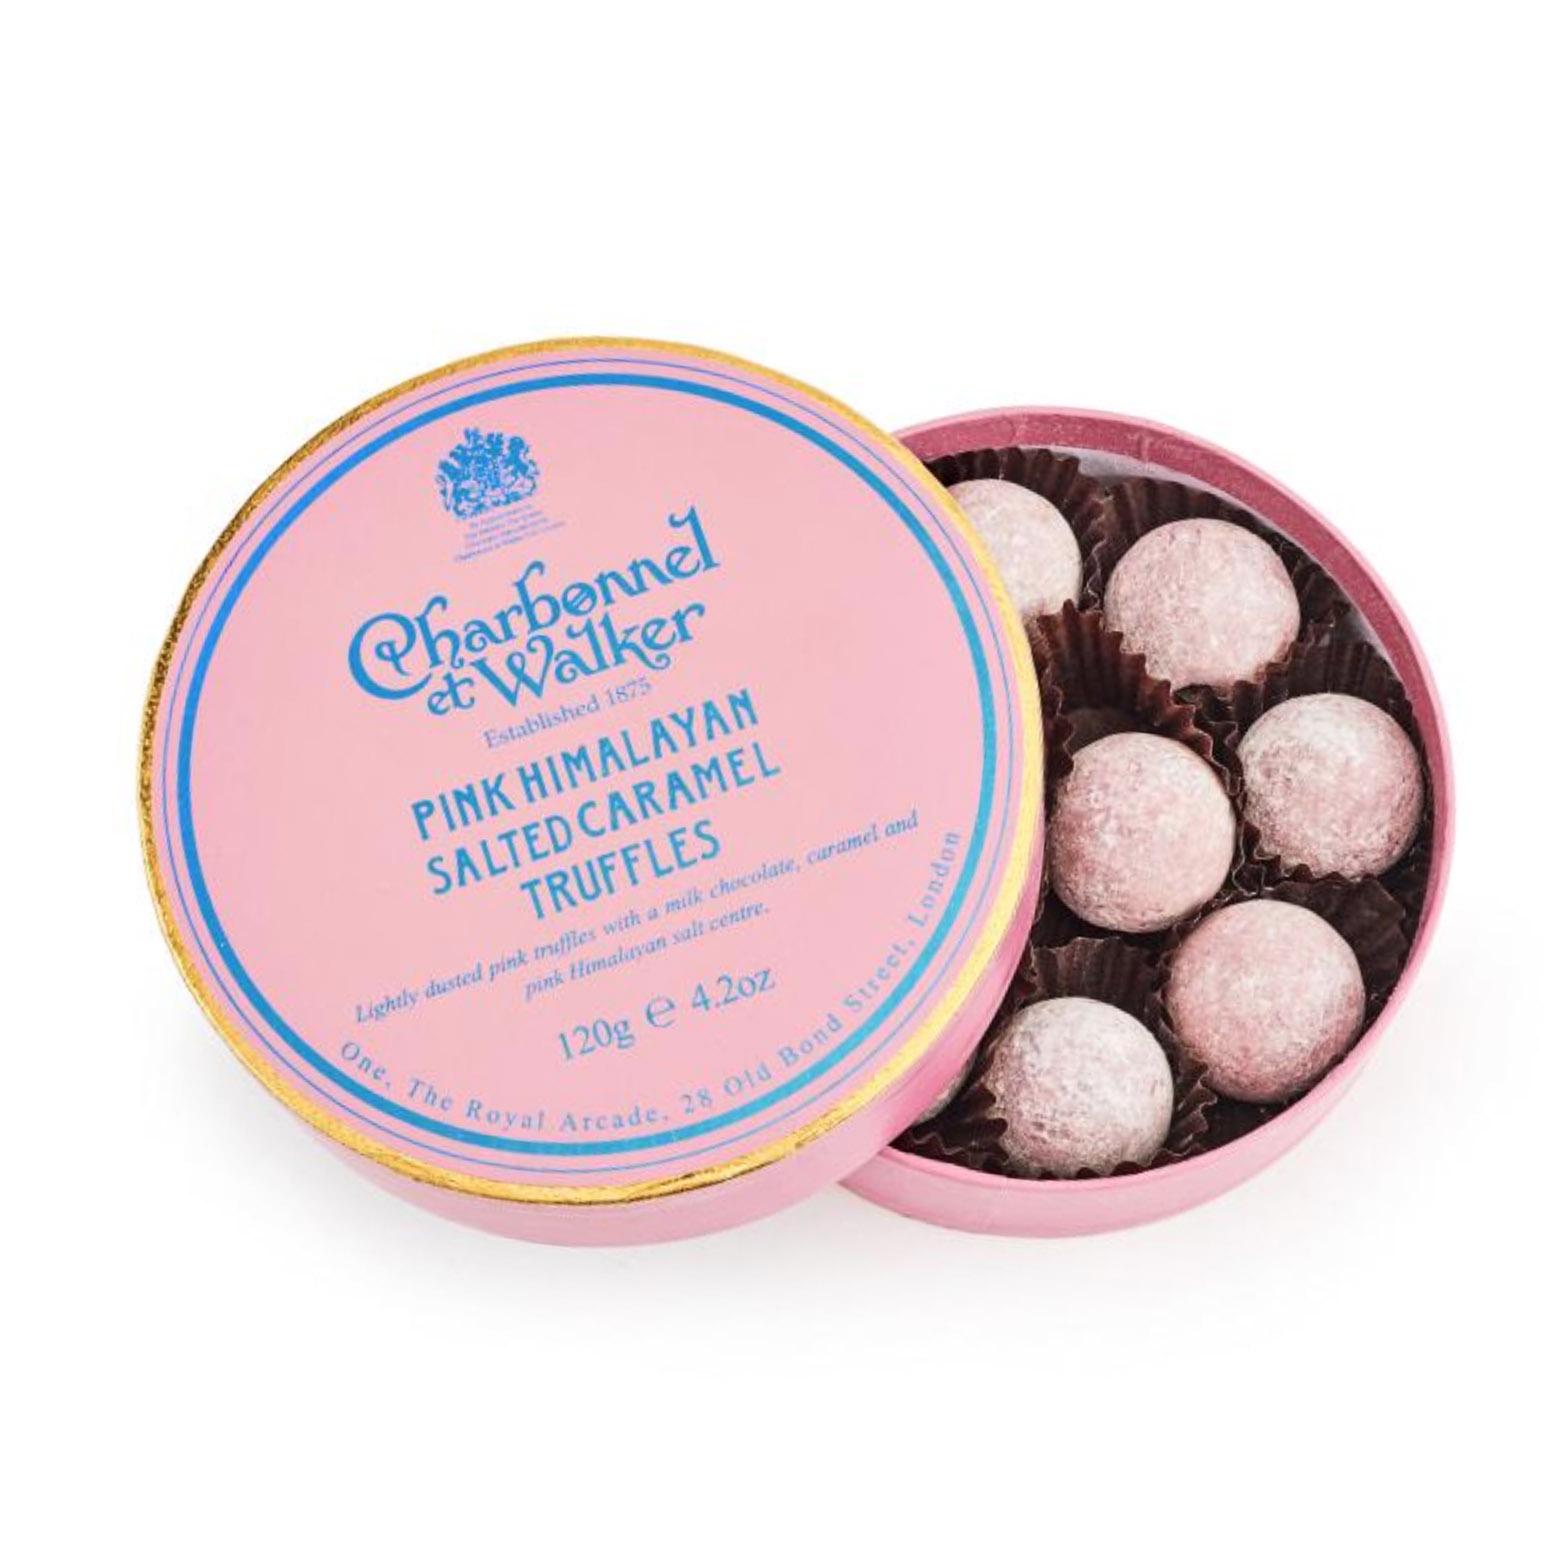 Charbonnel et Walker - Pink Himalayan salt caramel truffles -